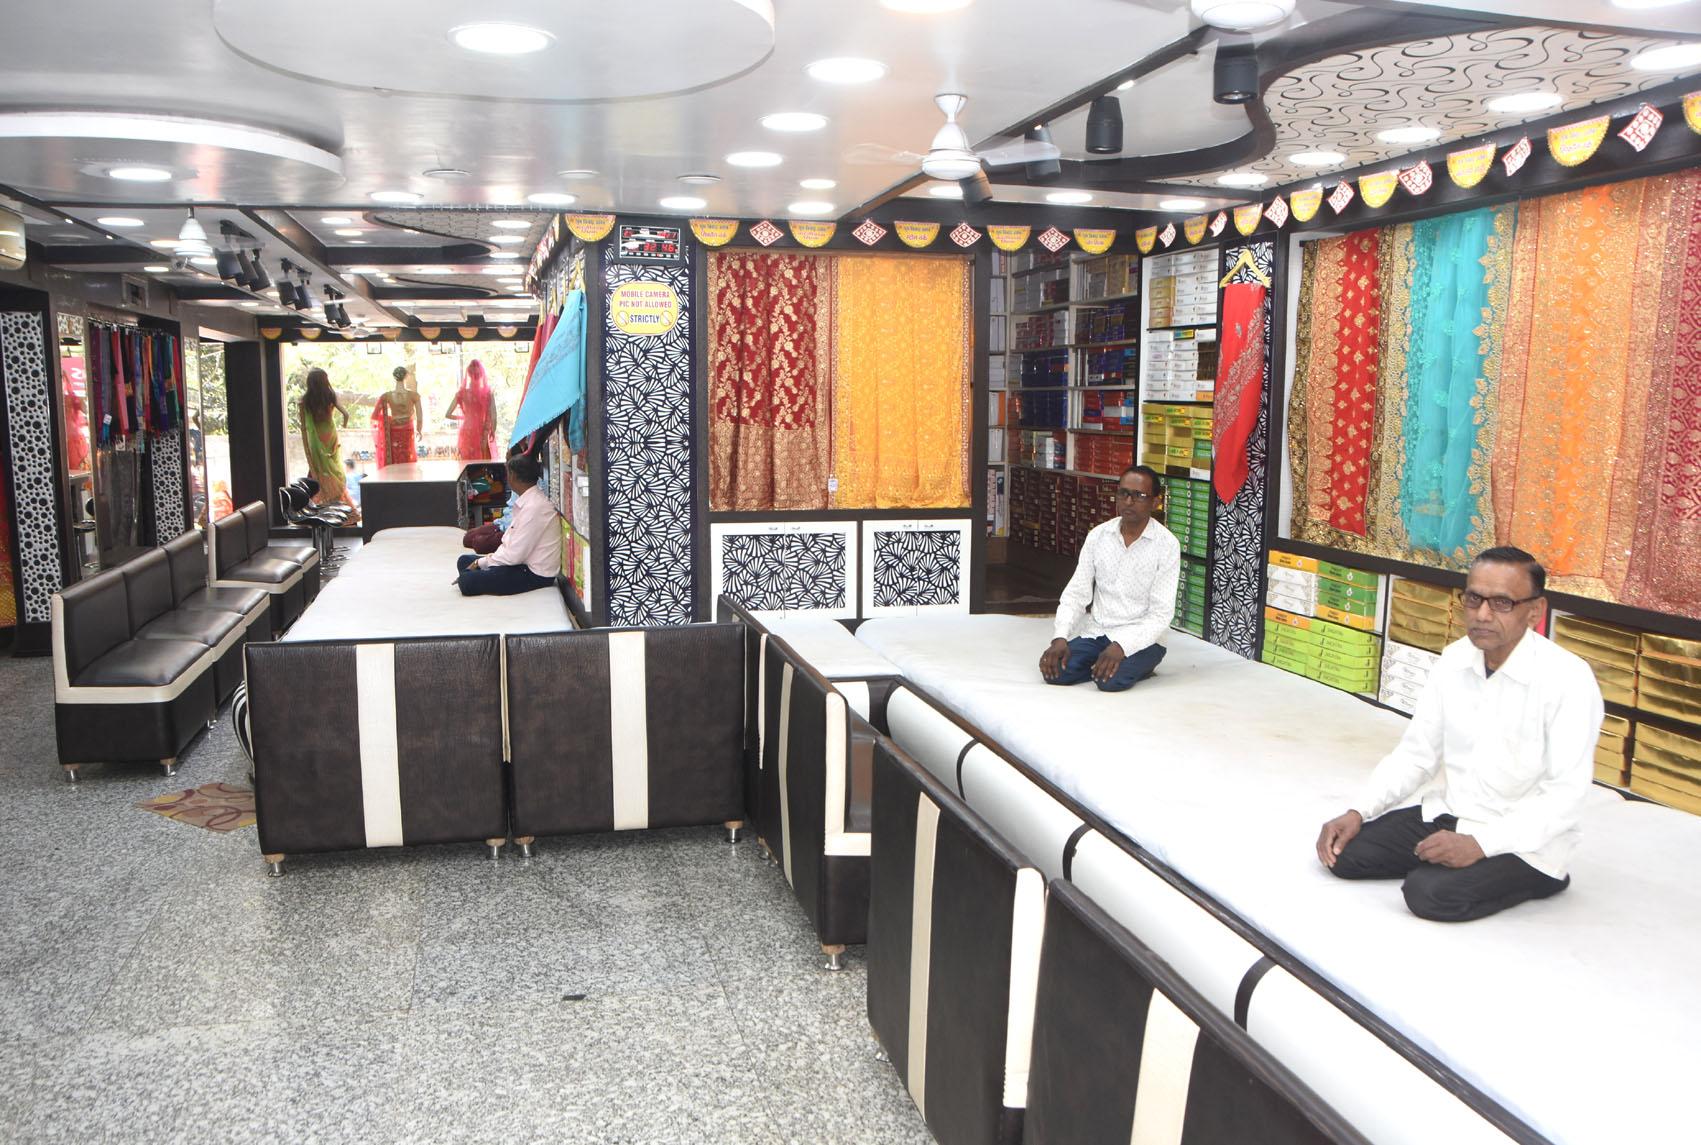 A sari shop awaits customers at Hirapur Park Market in Dhanbad on Thursday.